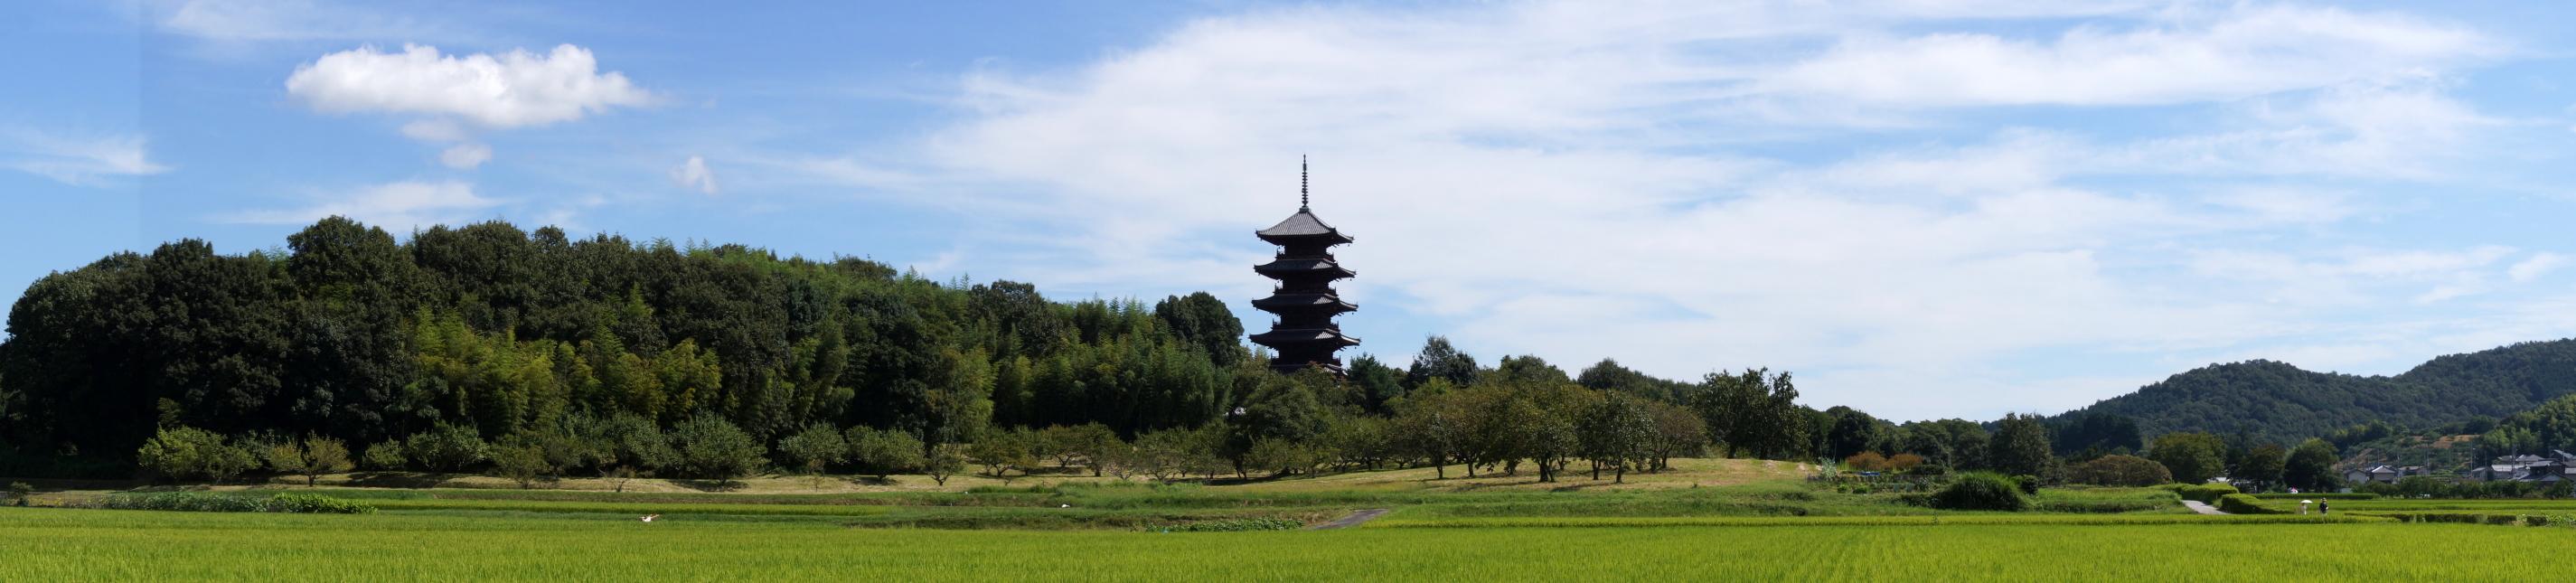 kibiji-bitchu-kokubunji-five-stored-pagoda